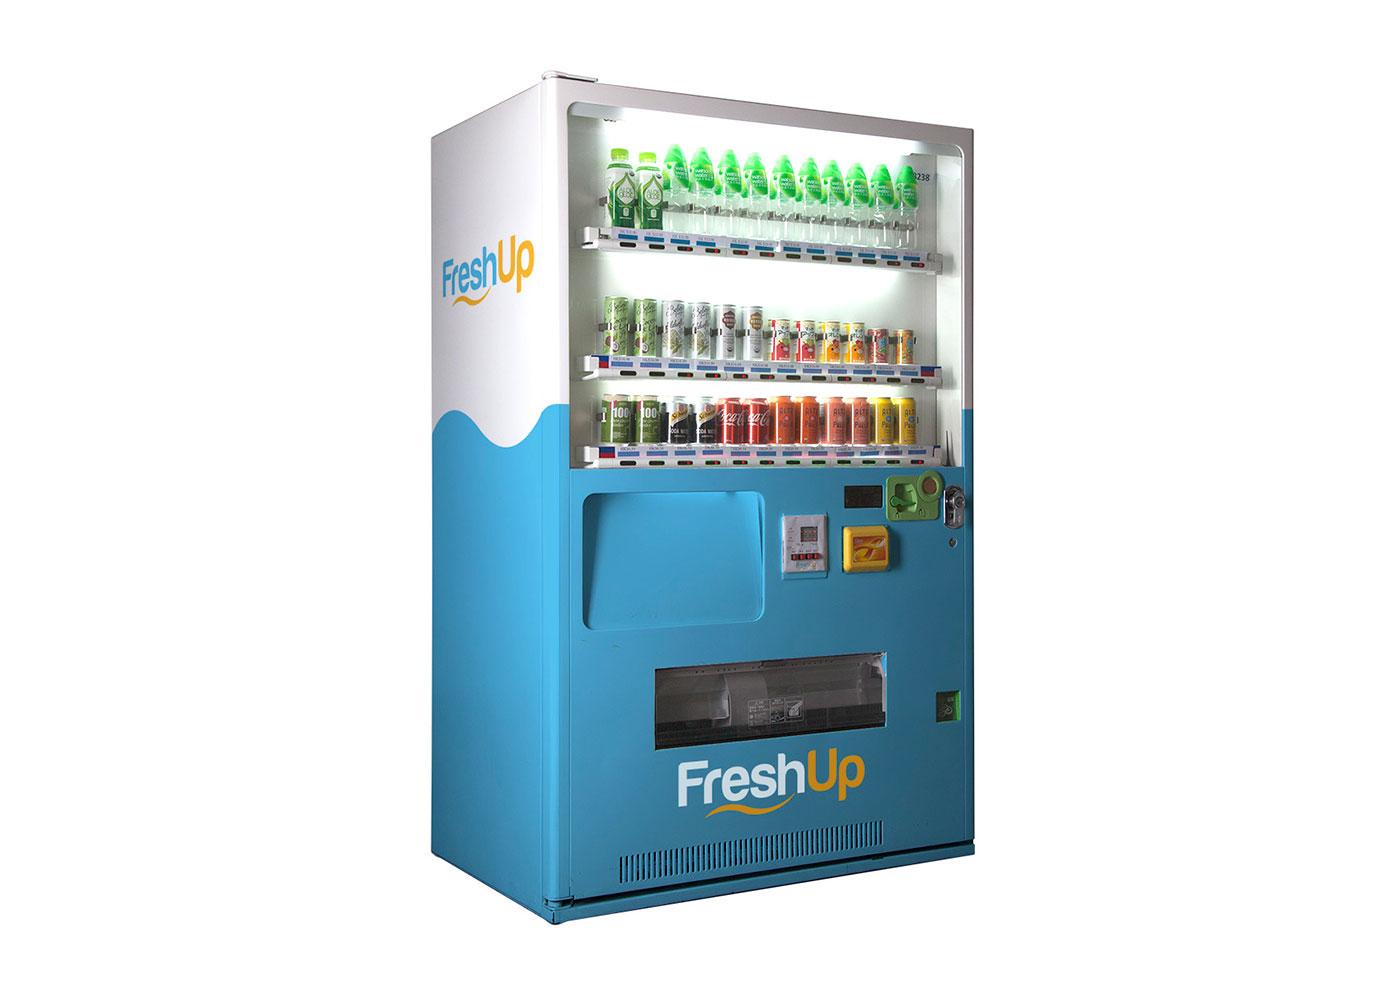 FreshUp, drinks, vending machine hong kong, beverages, fast, convenient, smart vending machine hong kong, freshup vending machine, 36sku vending